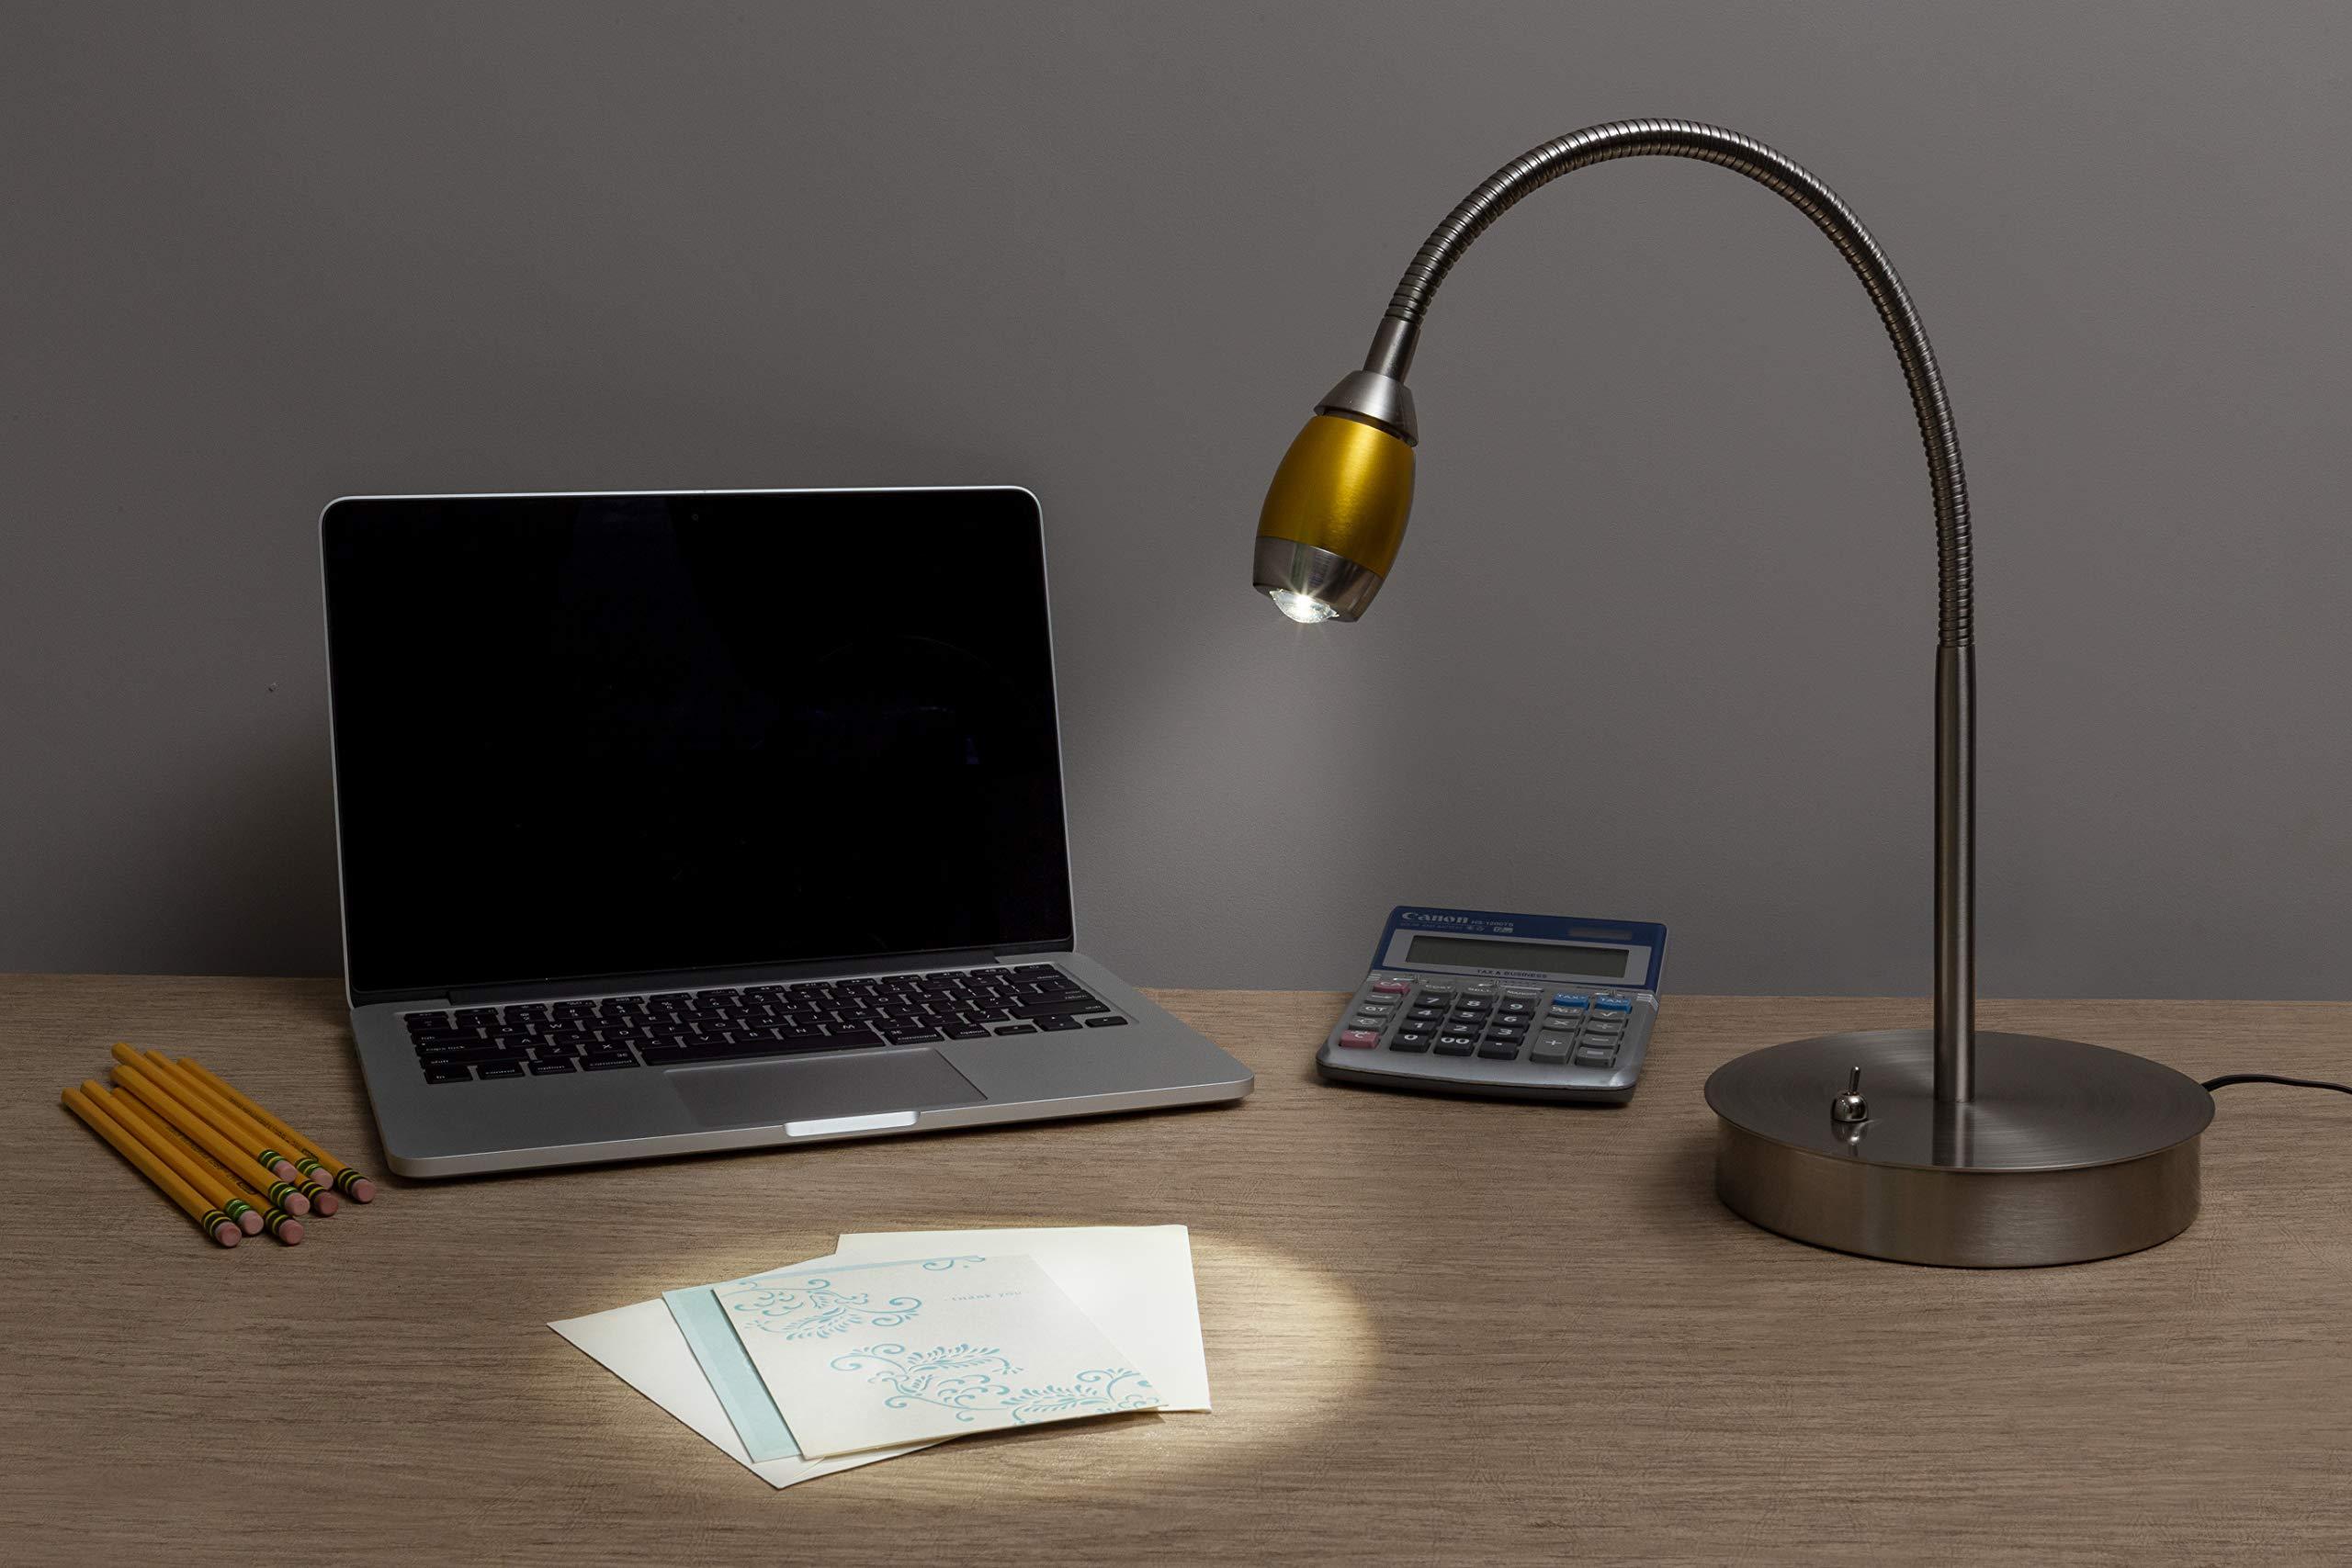 Daylight24 202071-39 Adjustable Beam LED Desk Lamp, 7'' x 6'' x 19.5'', Brushed Nickel/Gold by daylight24 (Image #5)